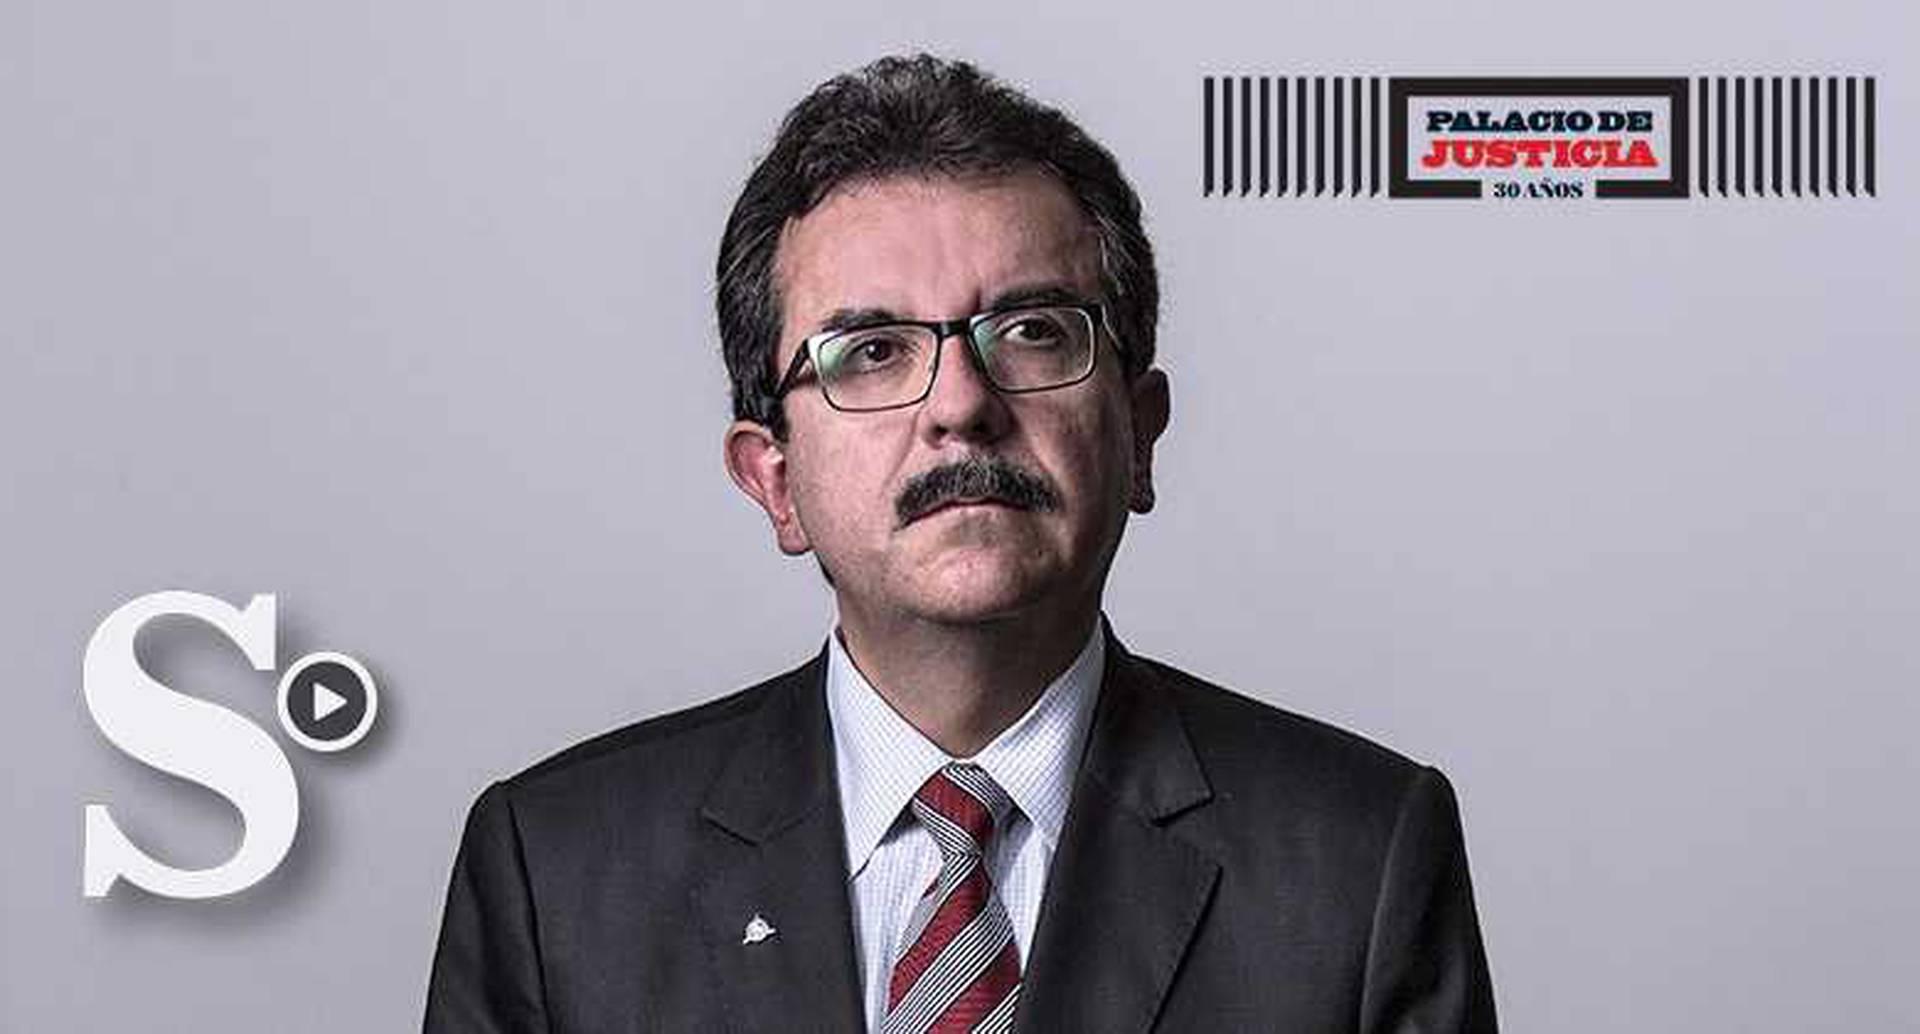 Carlos Medellín